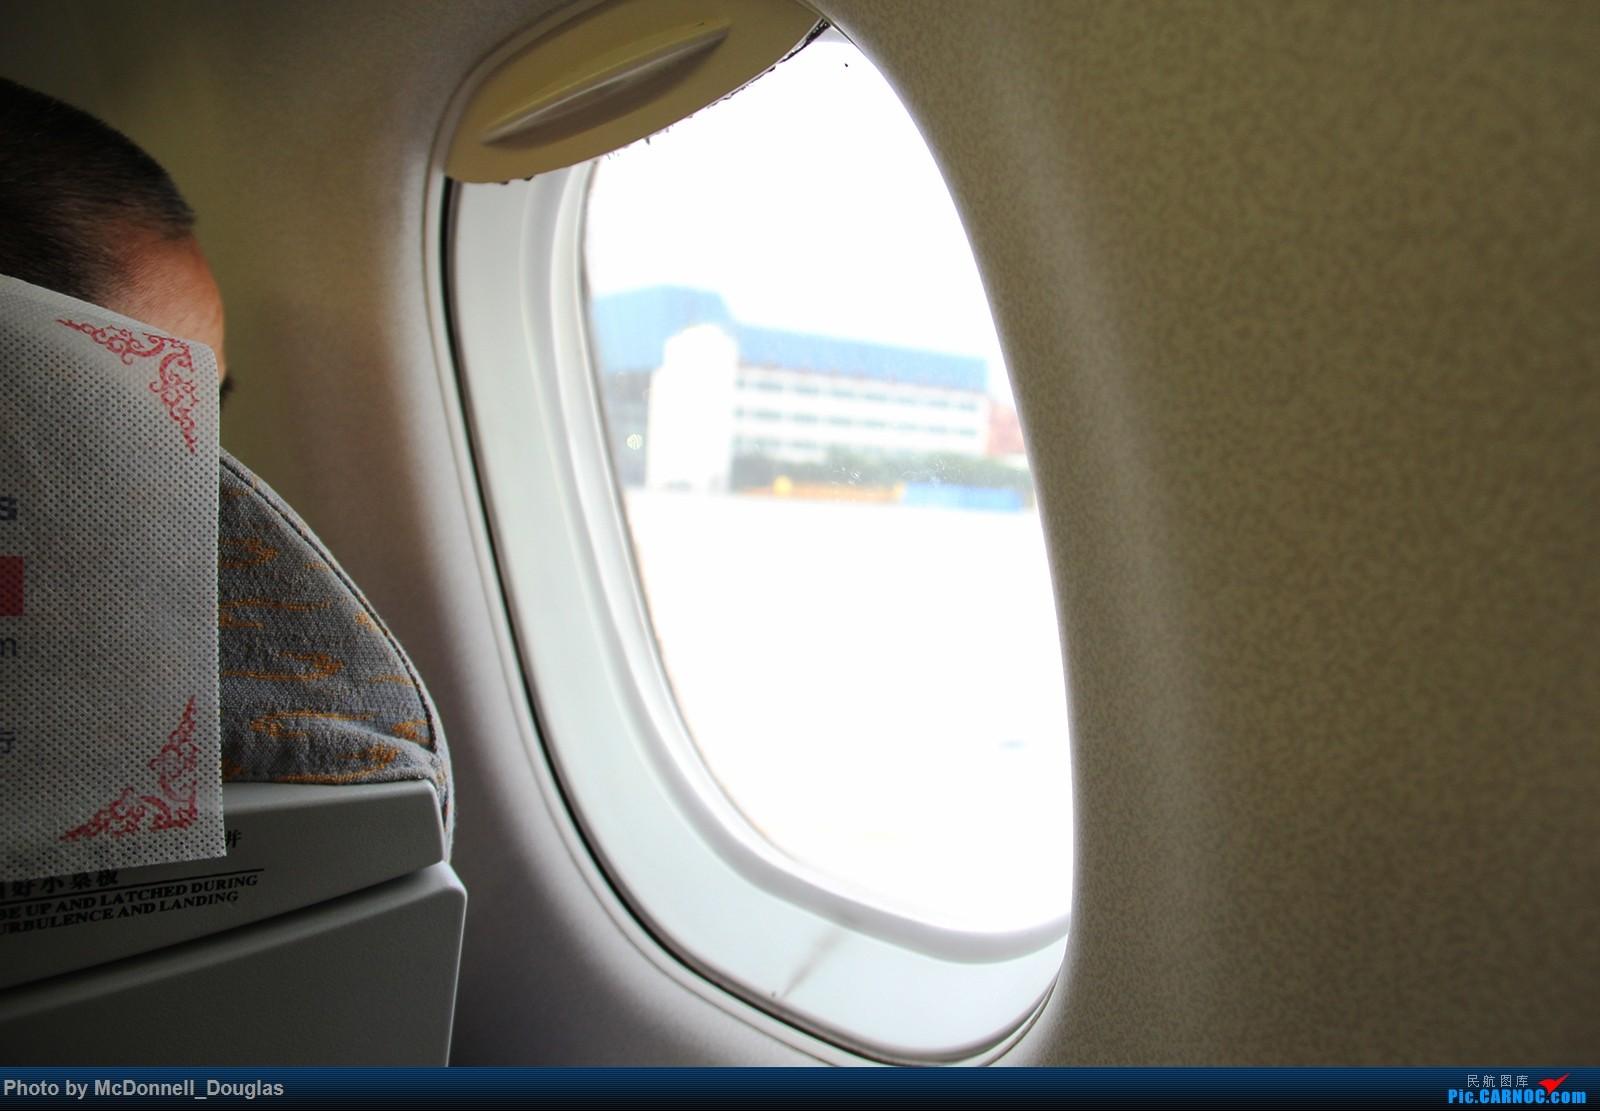 Re:[原创]【上海飞友会】【zc带你走天下(2)】再访祖辈年轻时工作的土地,父母年少时生活戈壁,跨越大半个中国去看新疆,回程小游蓉城(上) EMBRAER ERJ-190LR B-3120 中国乌鲁木齐地窝堡国际机场